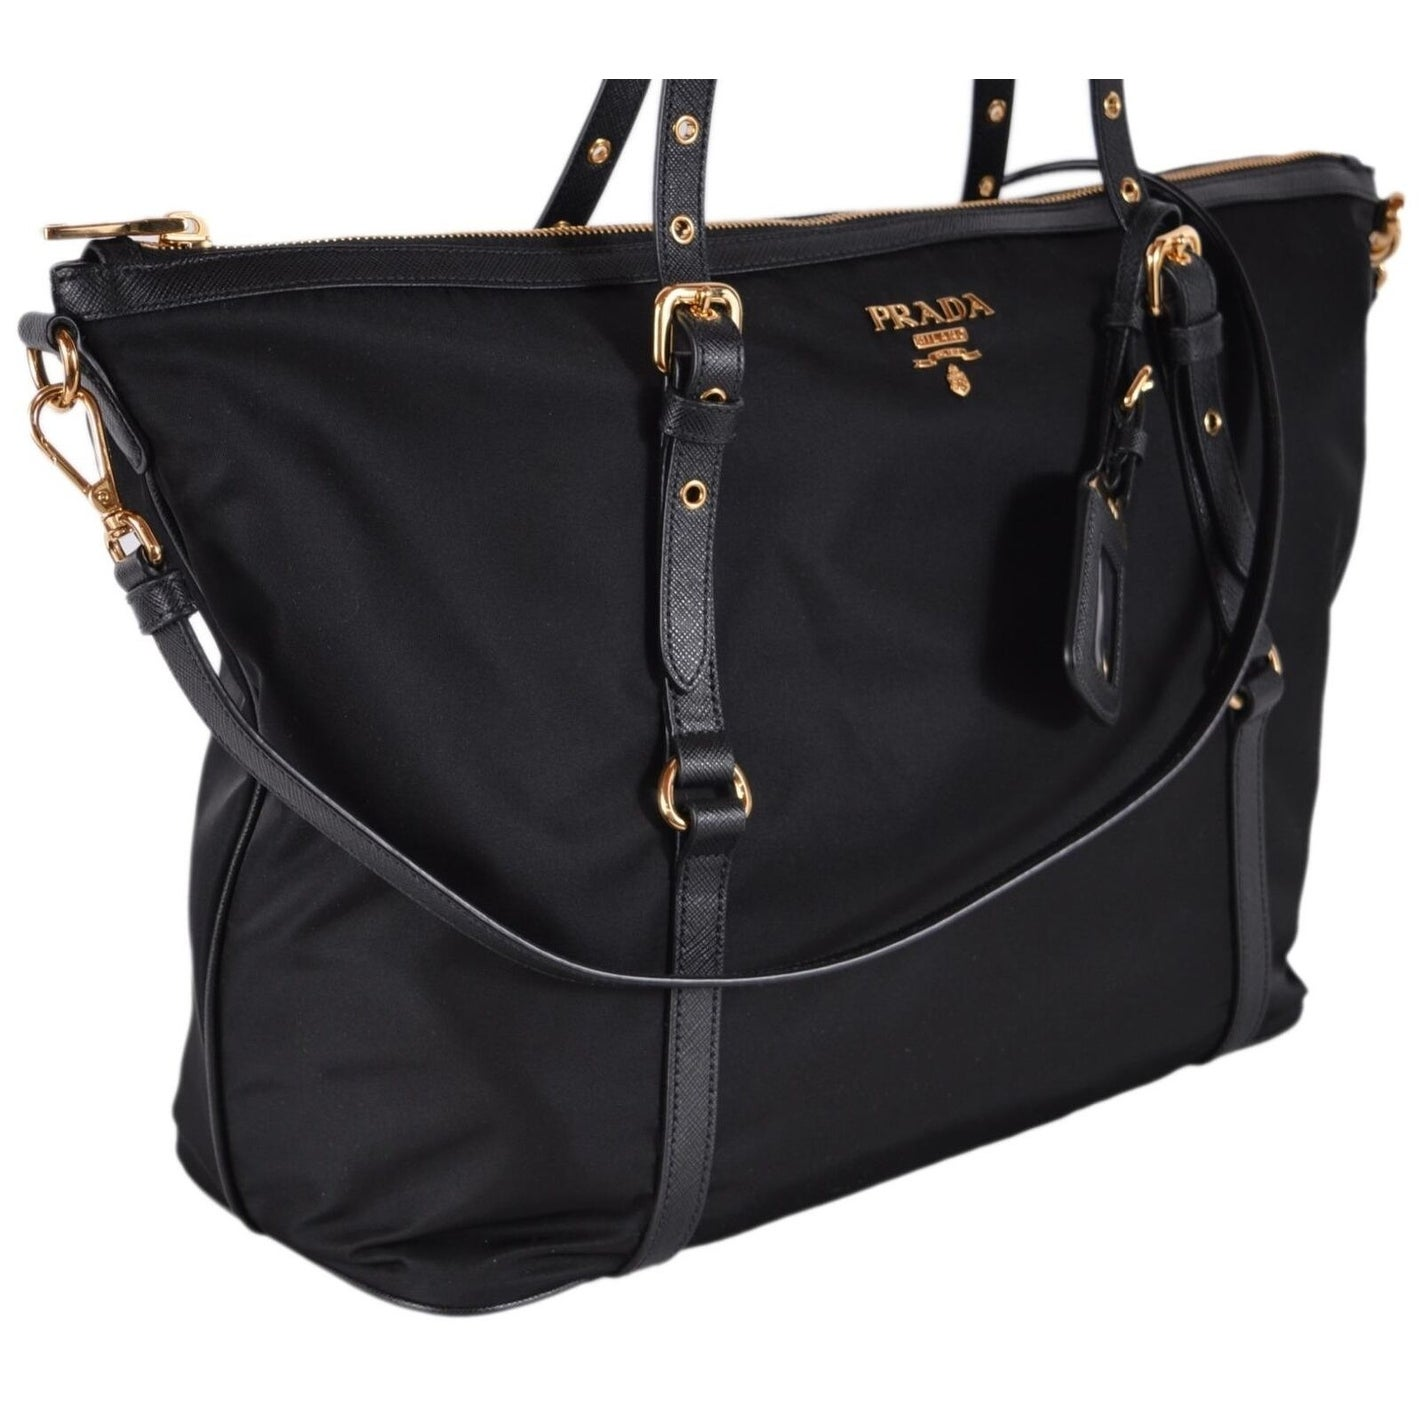 cf1e0601983f Shop Prada 1BG253 Black Tessuto Nylon Large Zip Top 2-Way Purse Shopper  Handbag - Free Shipping Today - Overstock - 26885888